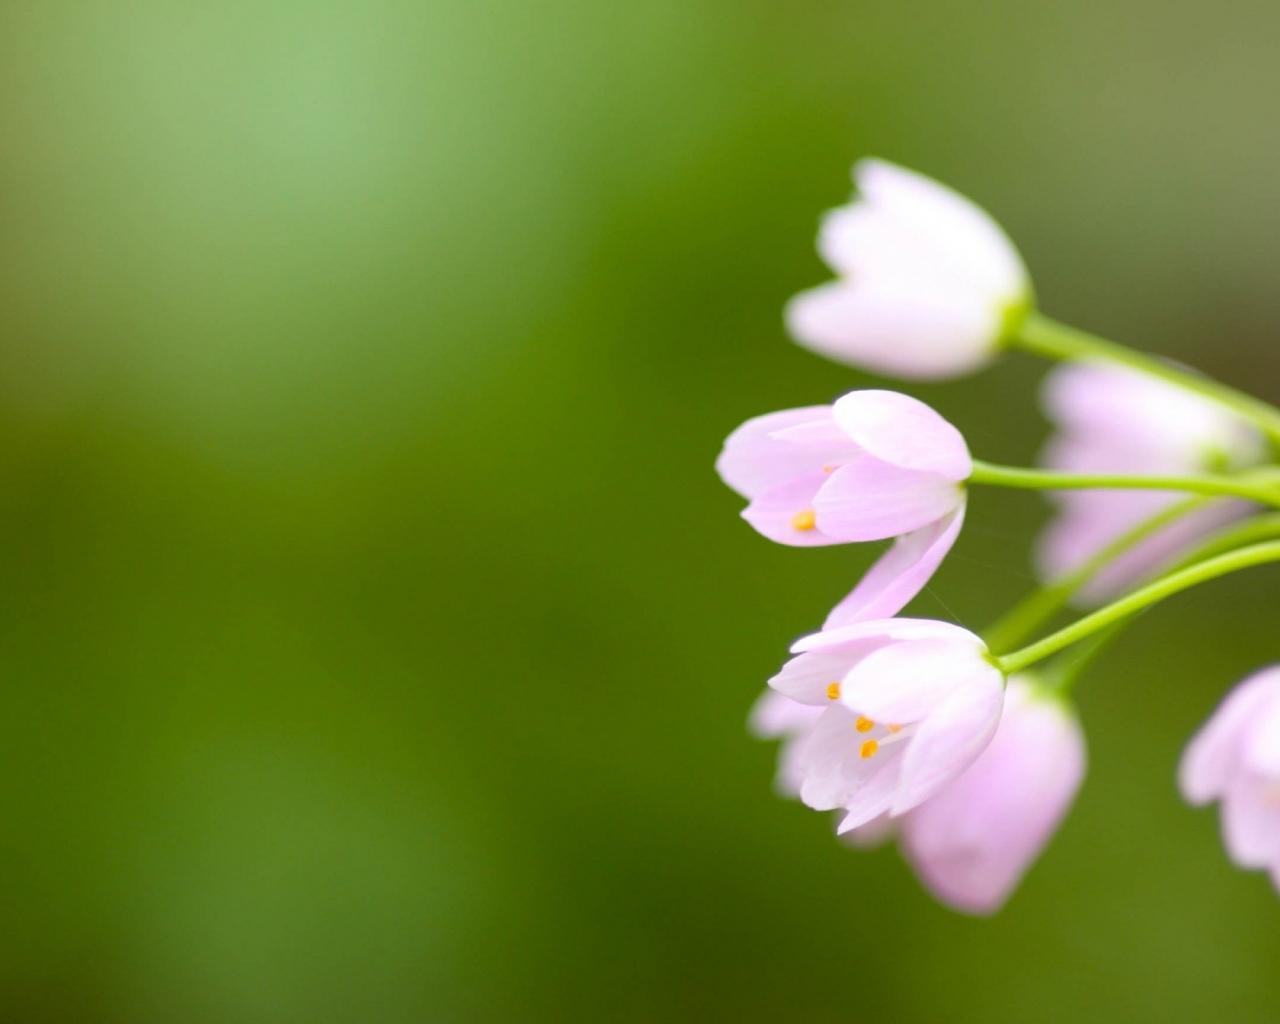 Flores tulipanes rosadas - 1280x1024